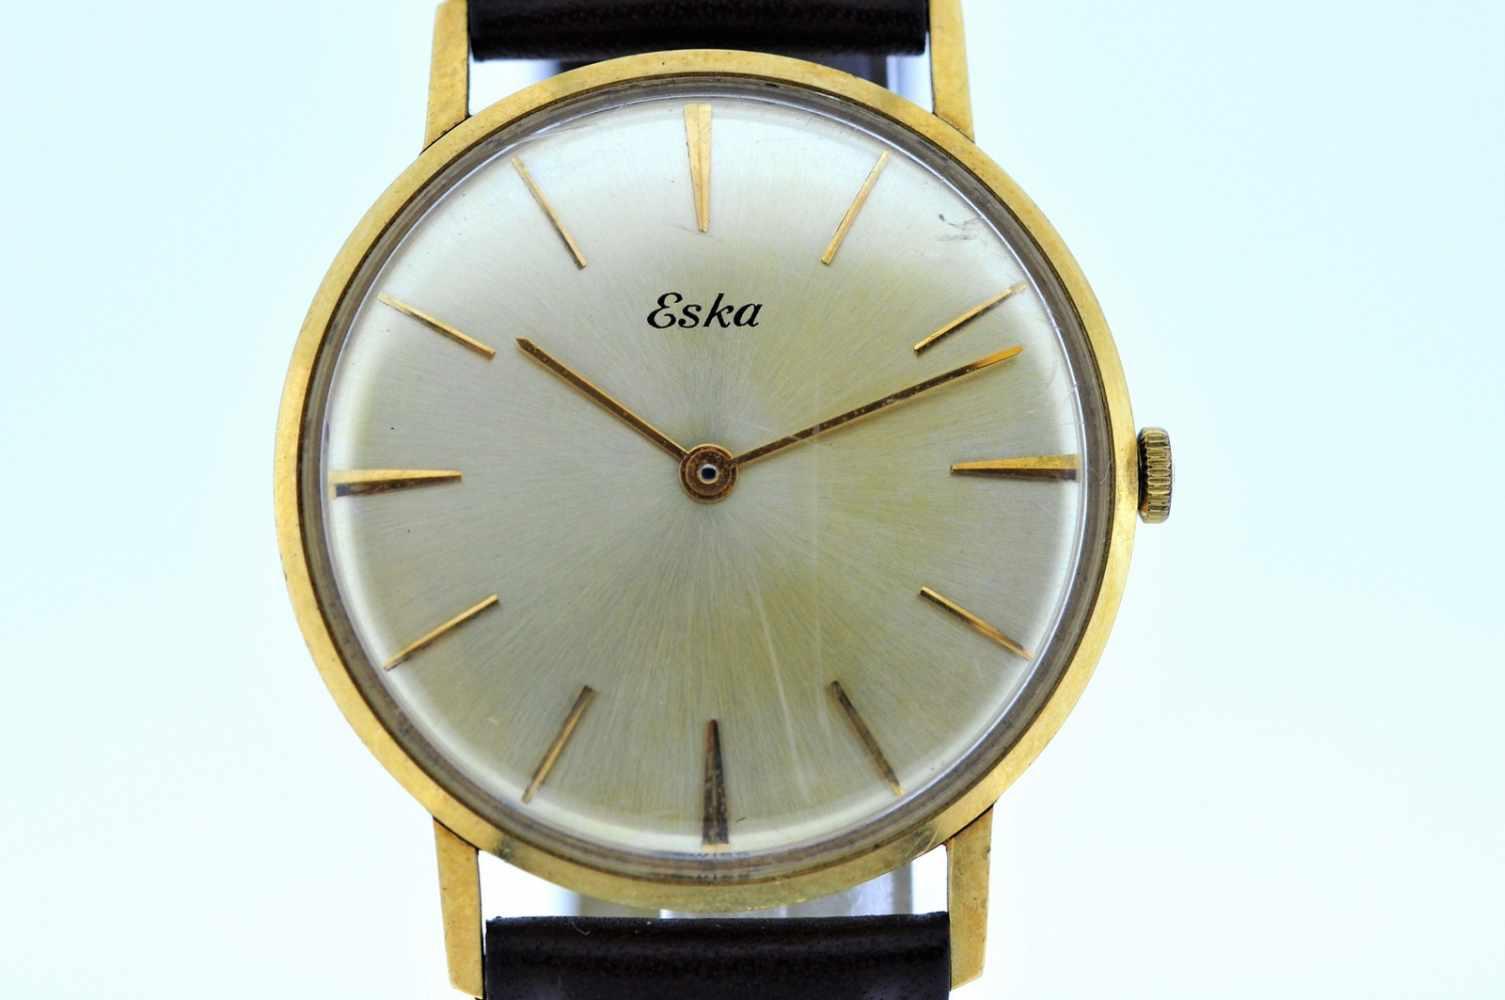 Eska Goldene Armbanduhr an Lederband, Eska, Handaufzug, Ankerwerk, Werkservice empfohlen, 28,1 g. - Bild 3 aus 6